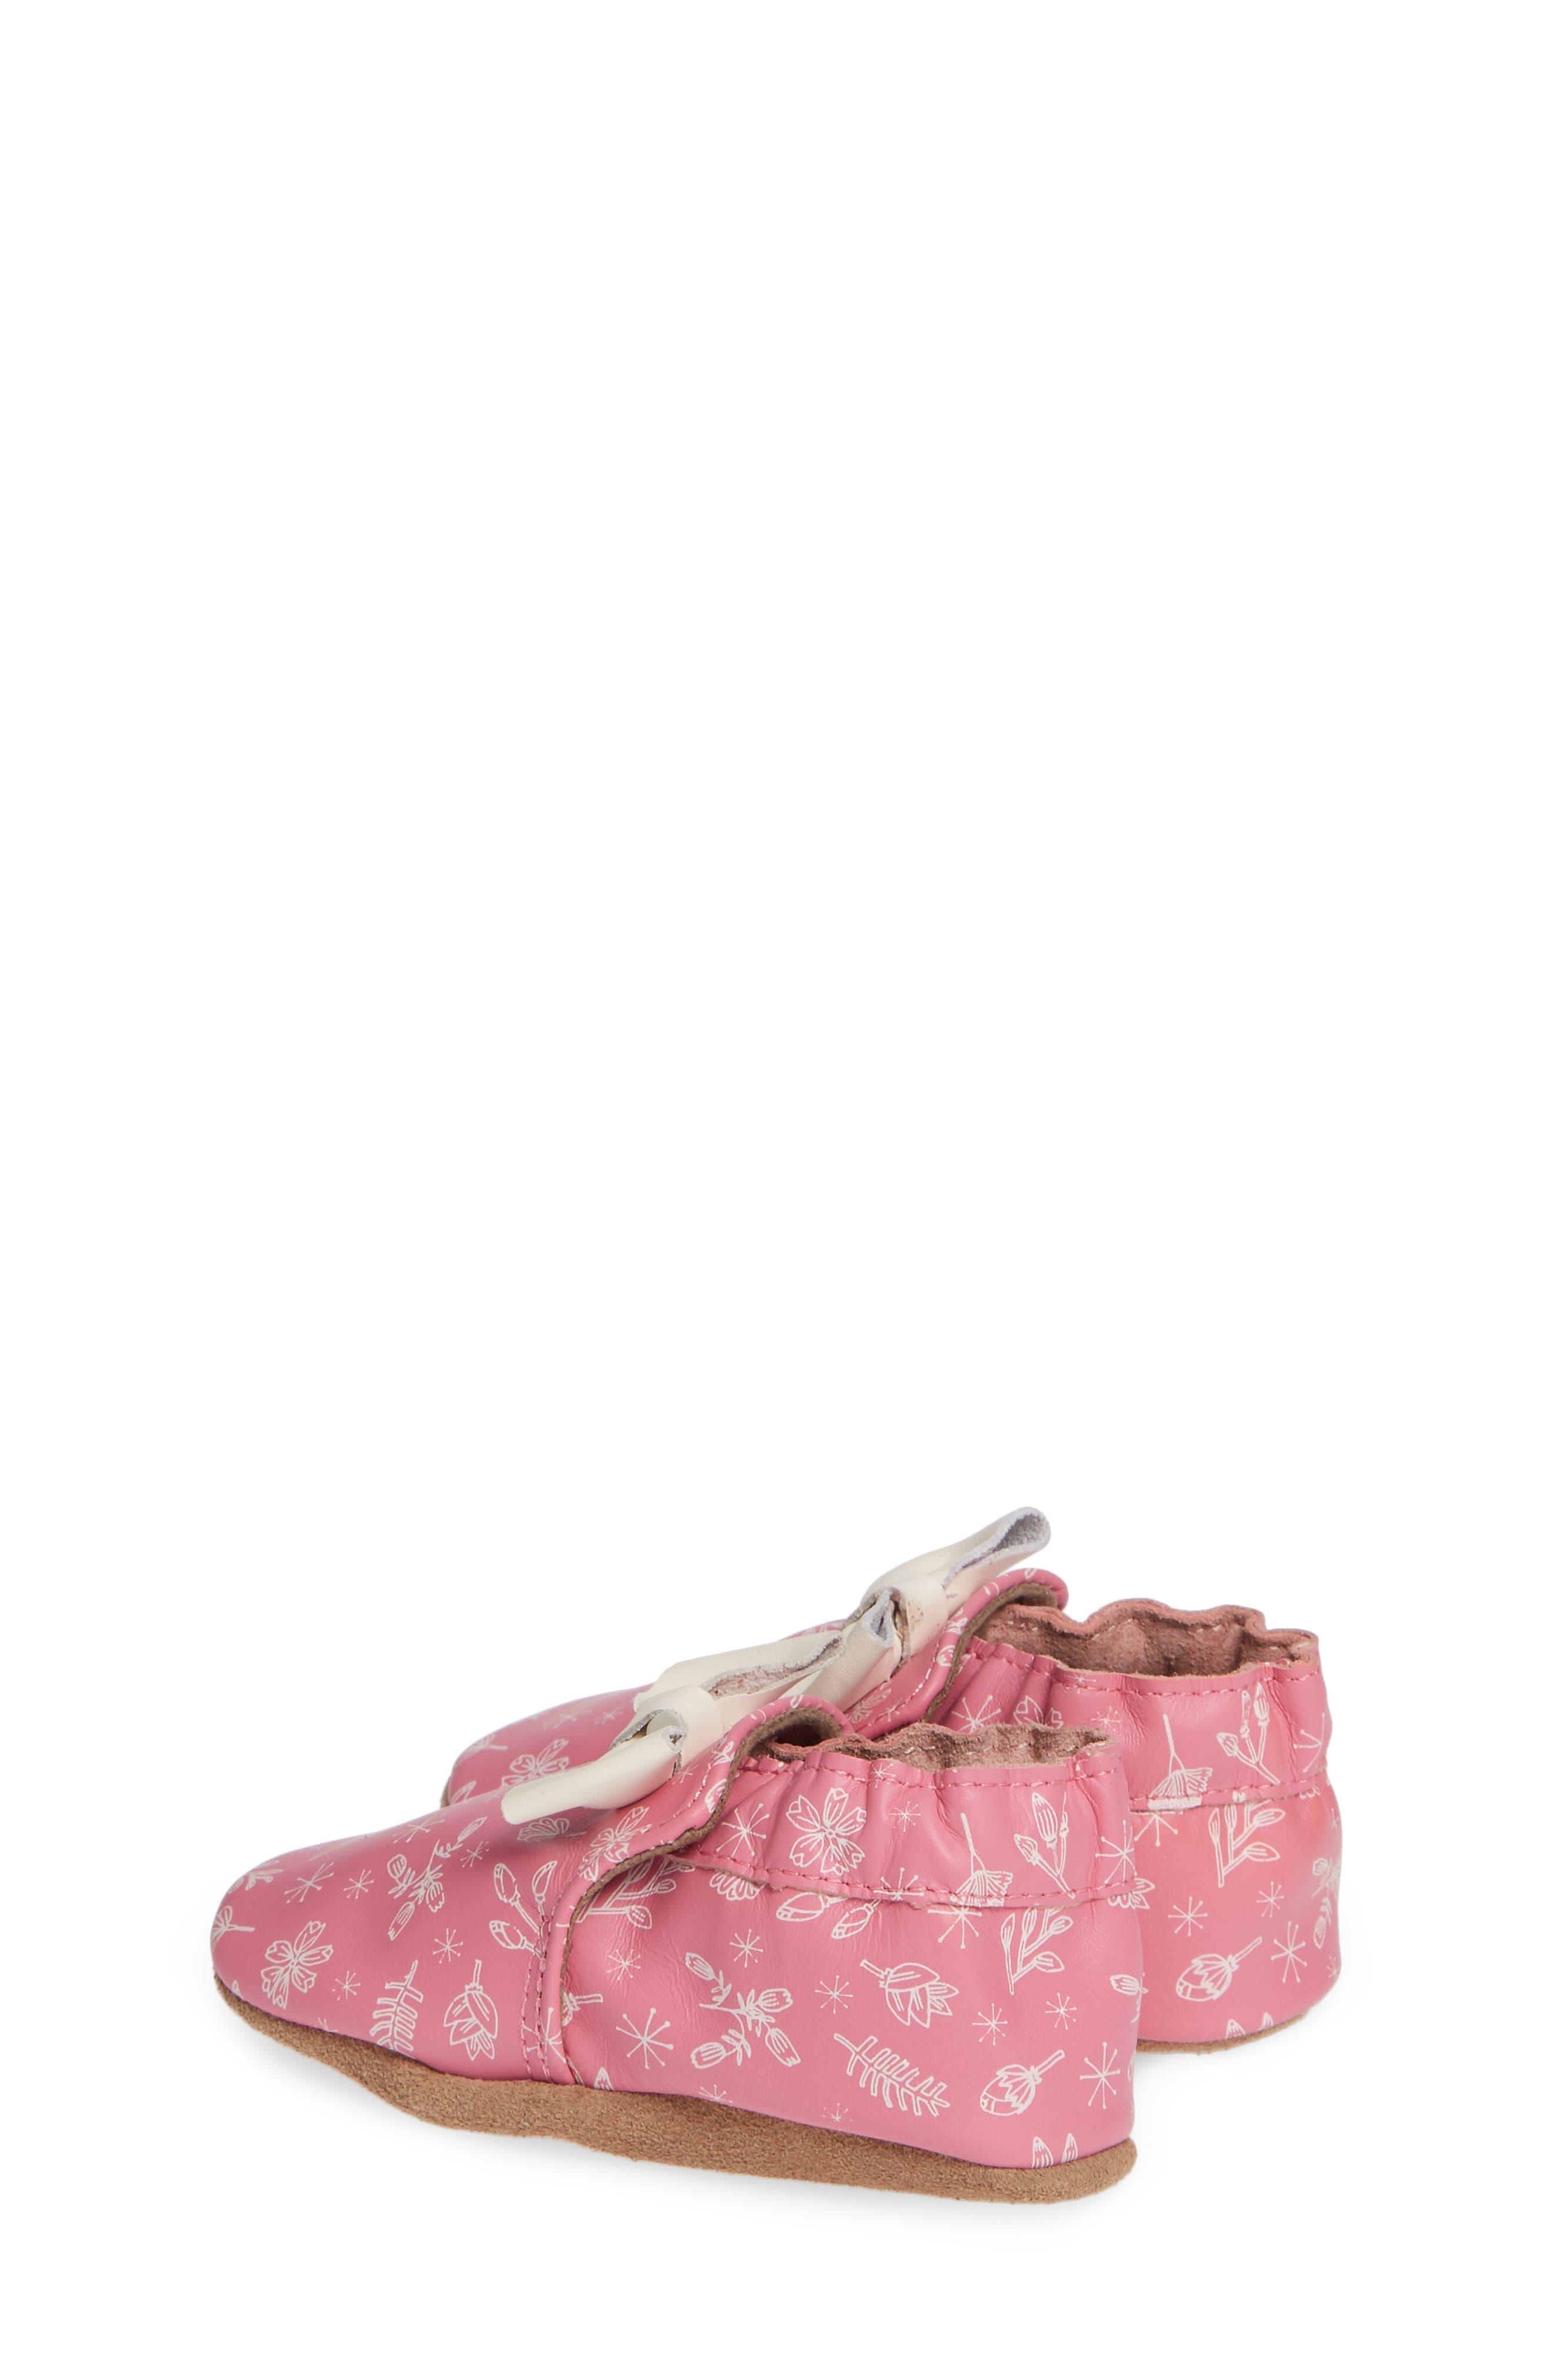 ROBEEZ<SUP>®</SUP>, Francesca Floral Crib Shoe, Alternate thumbnail 3, color, PINK